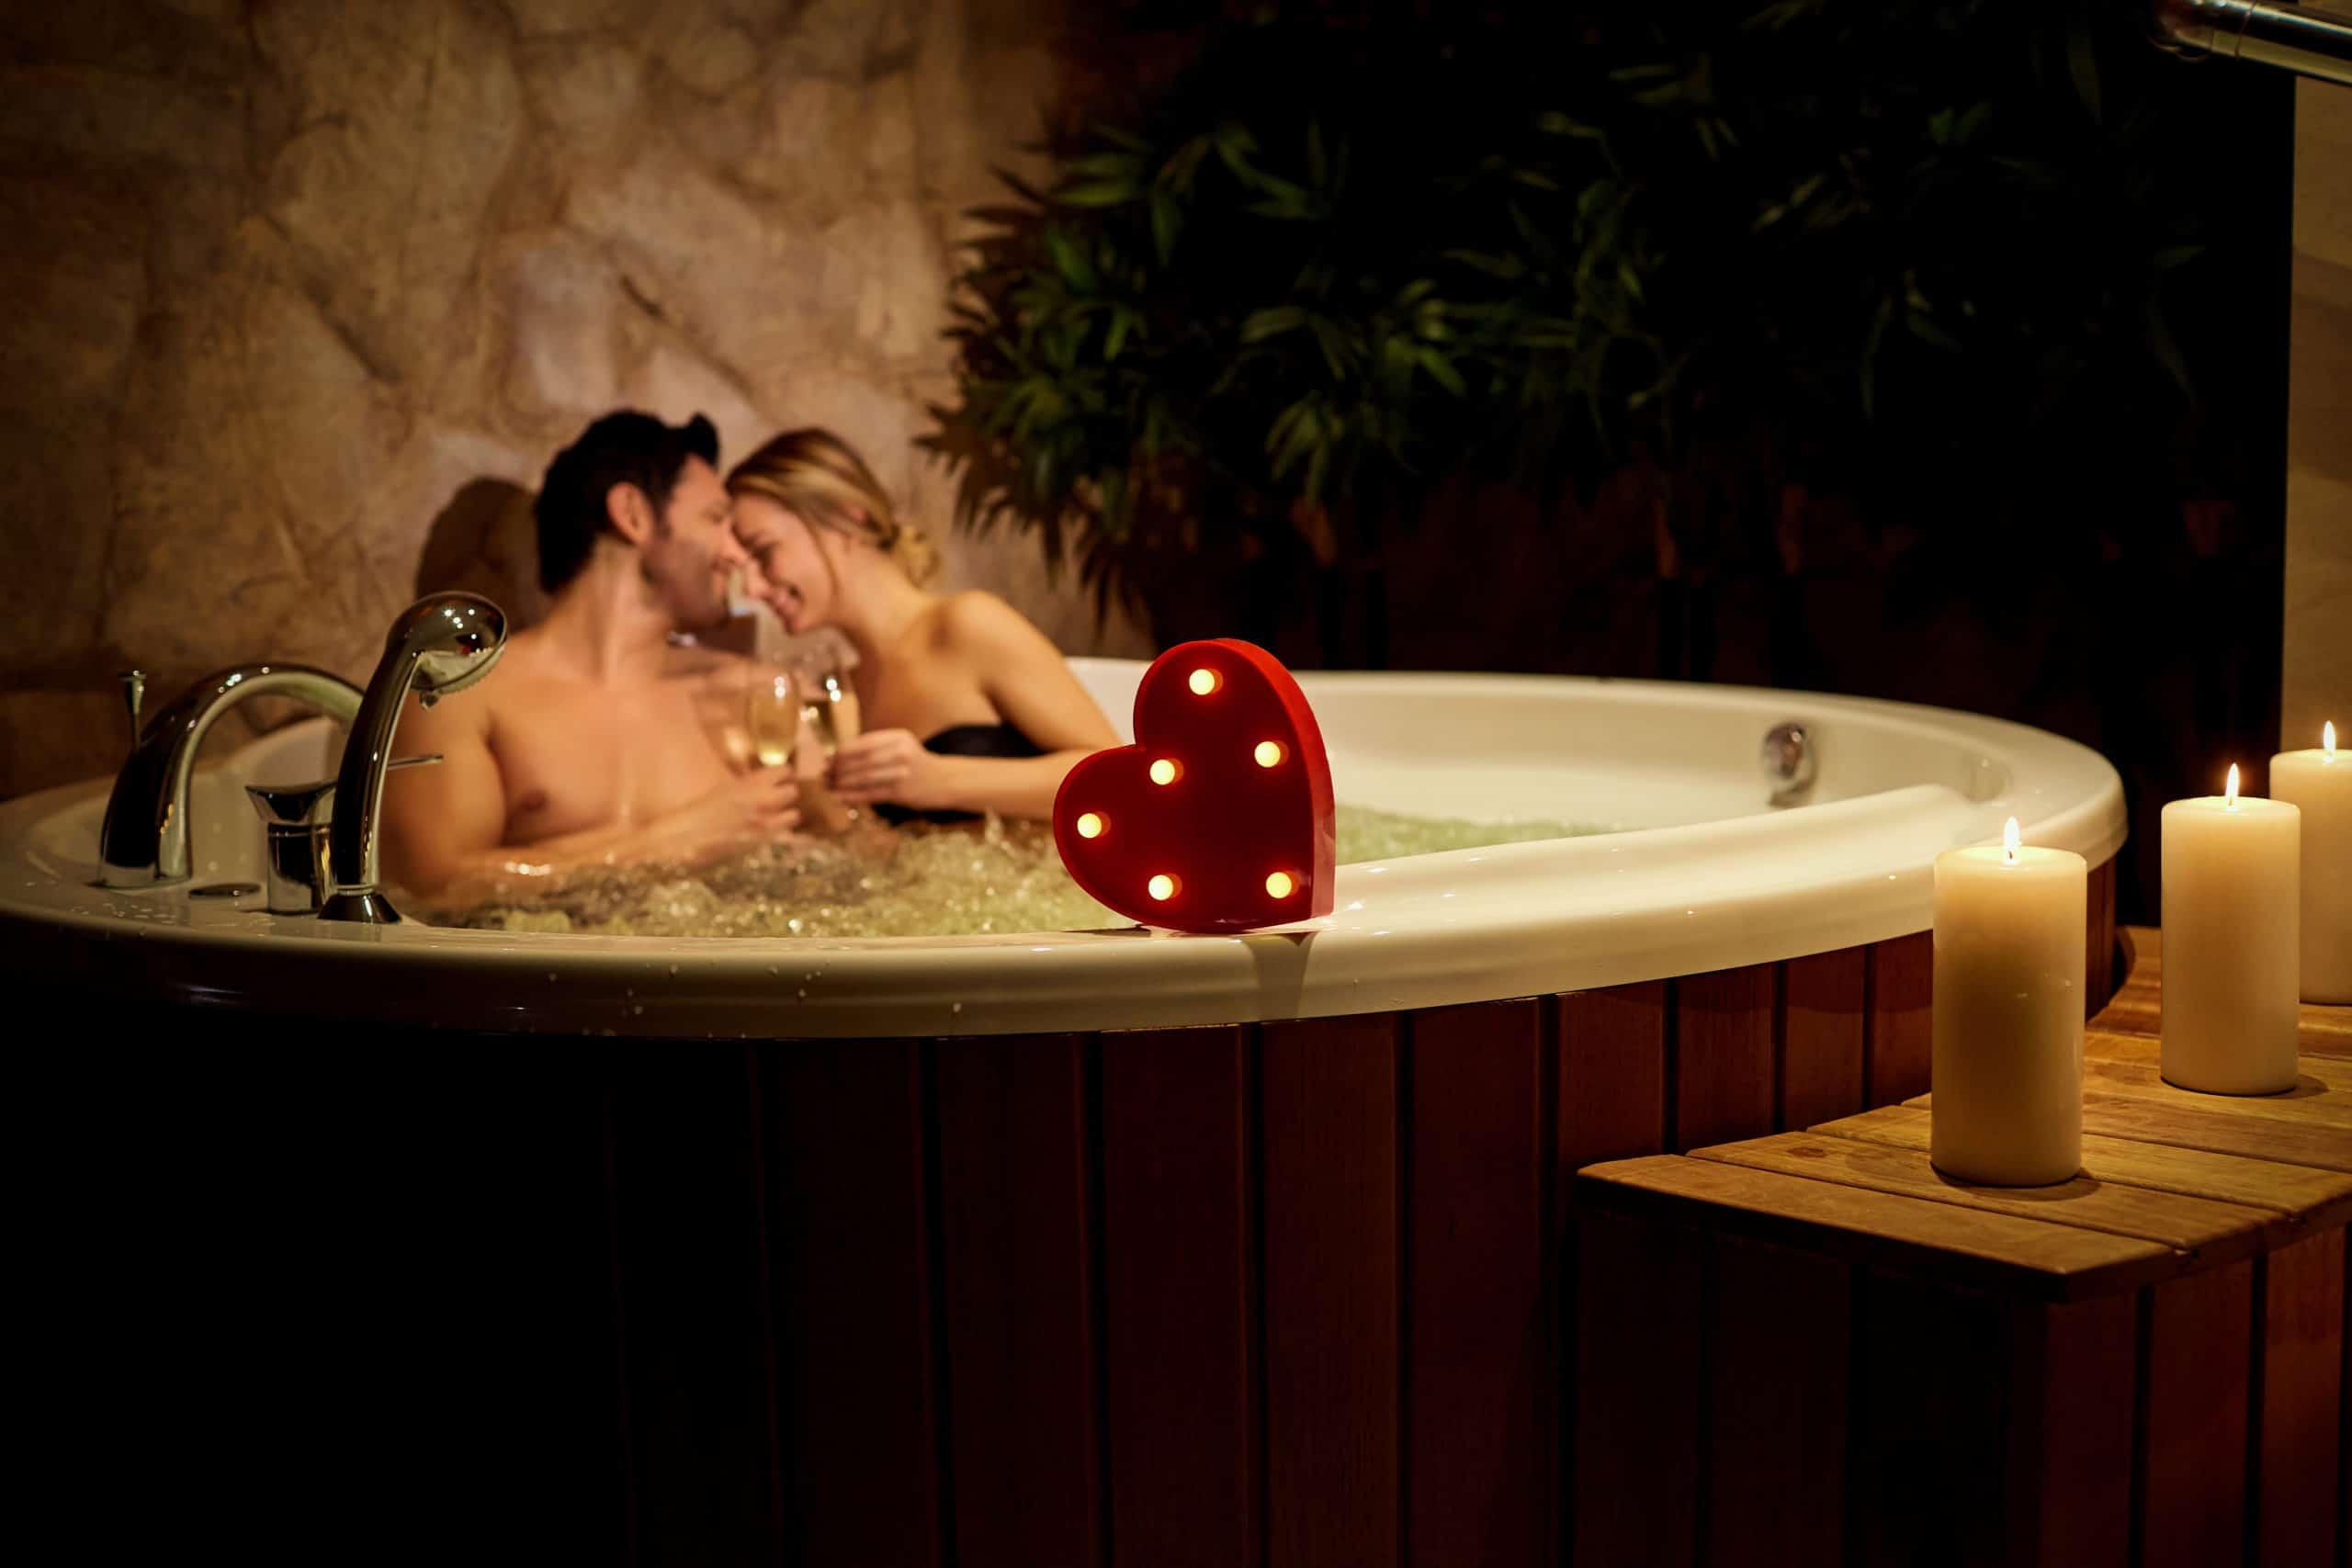 Spa Domicile Amoureux 1 Scaled